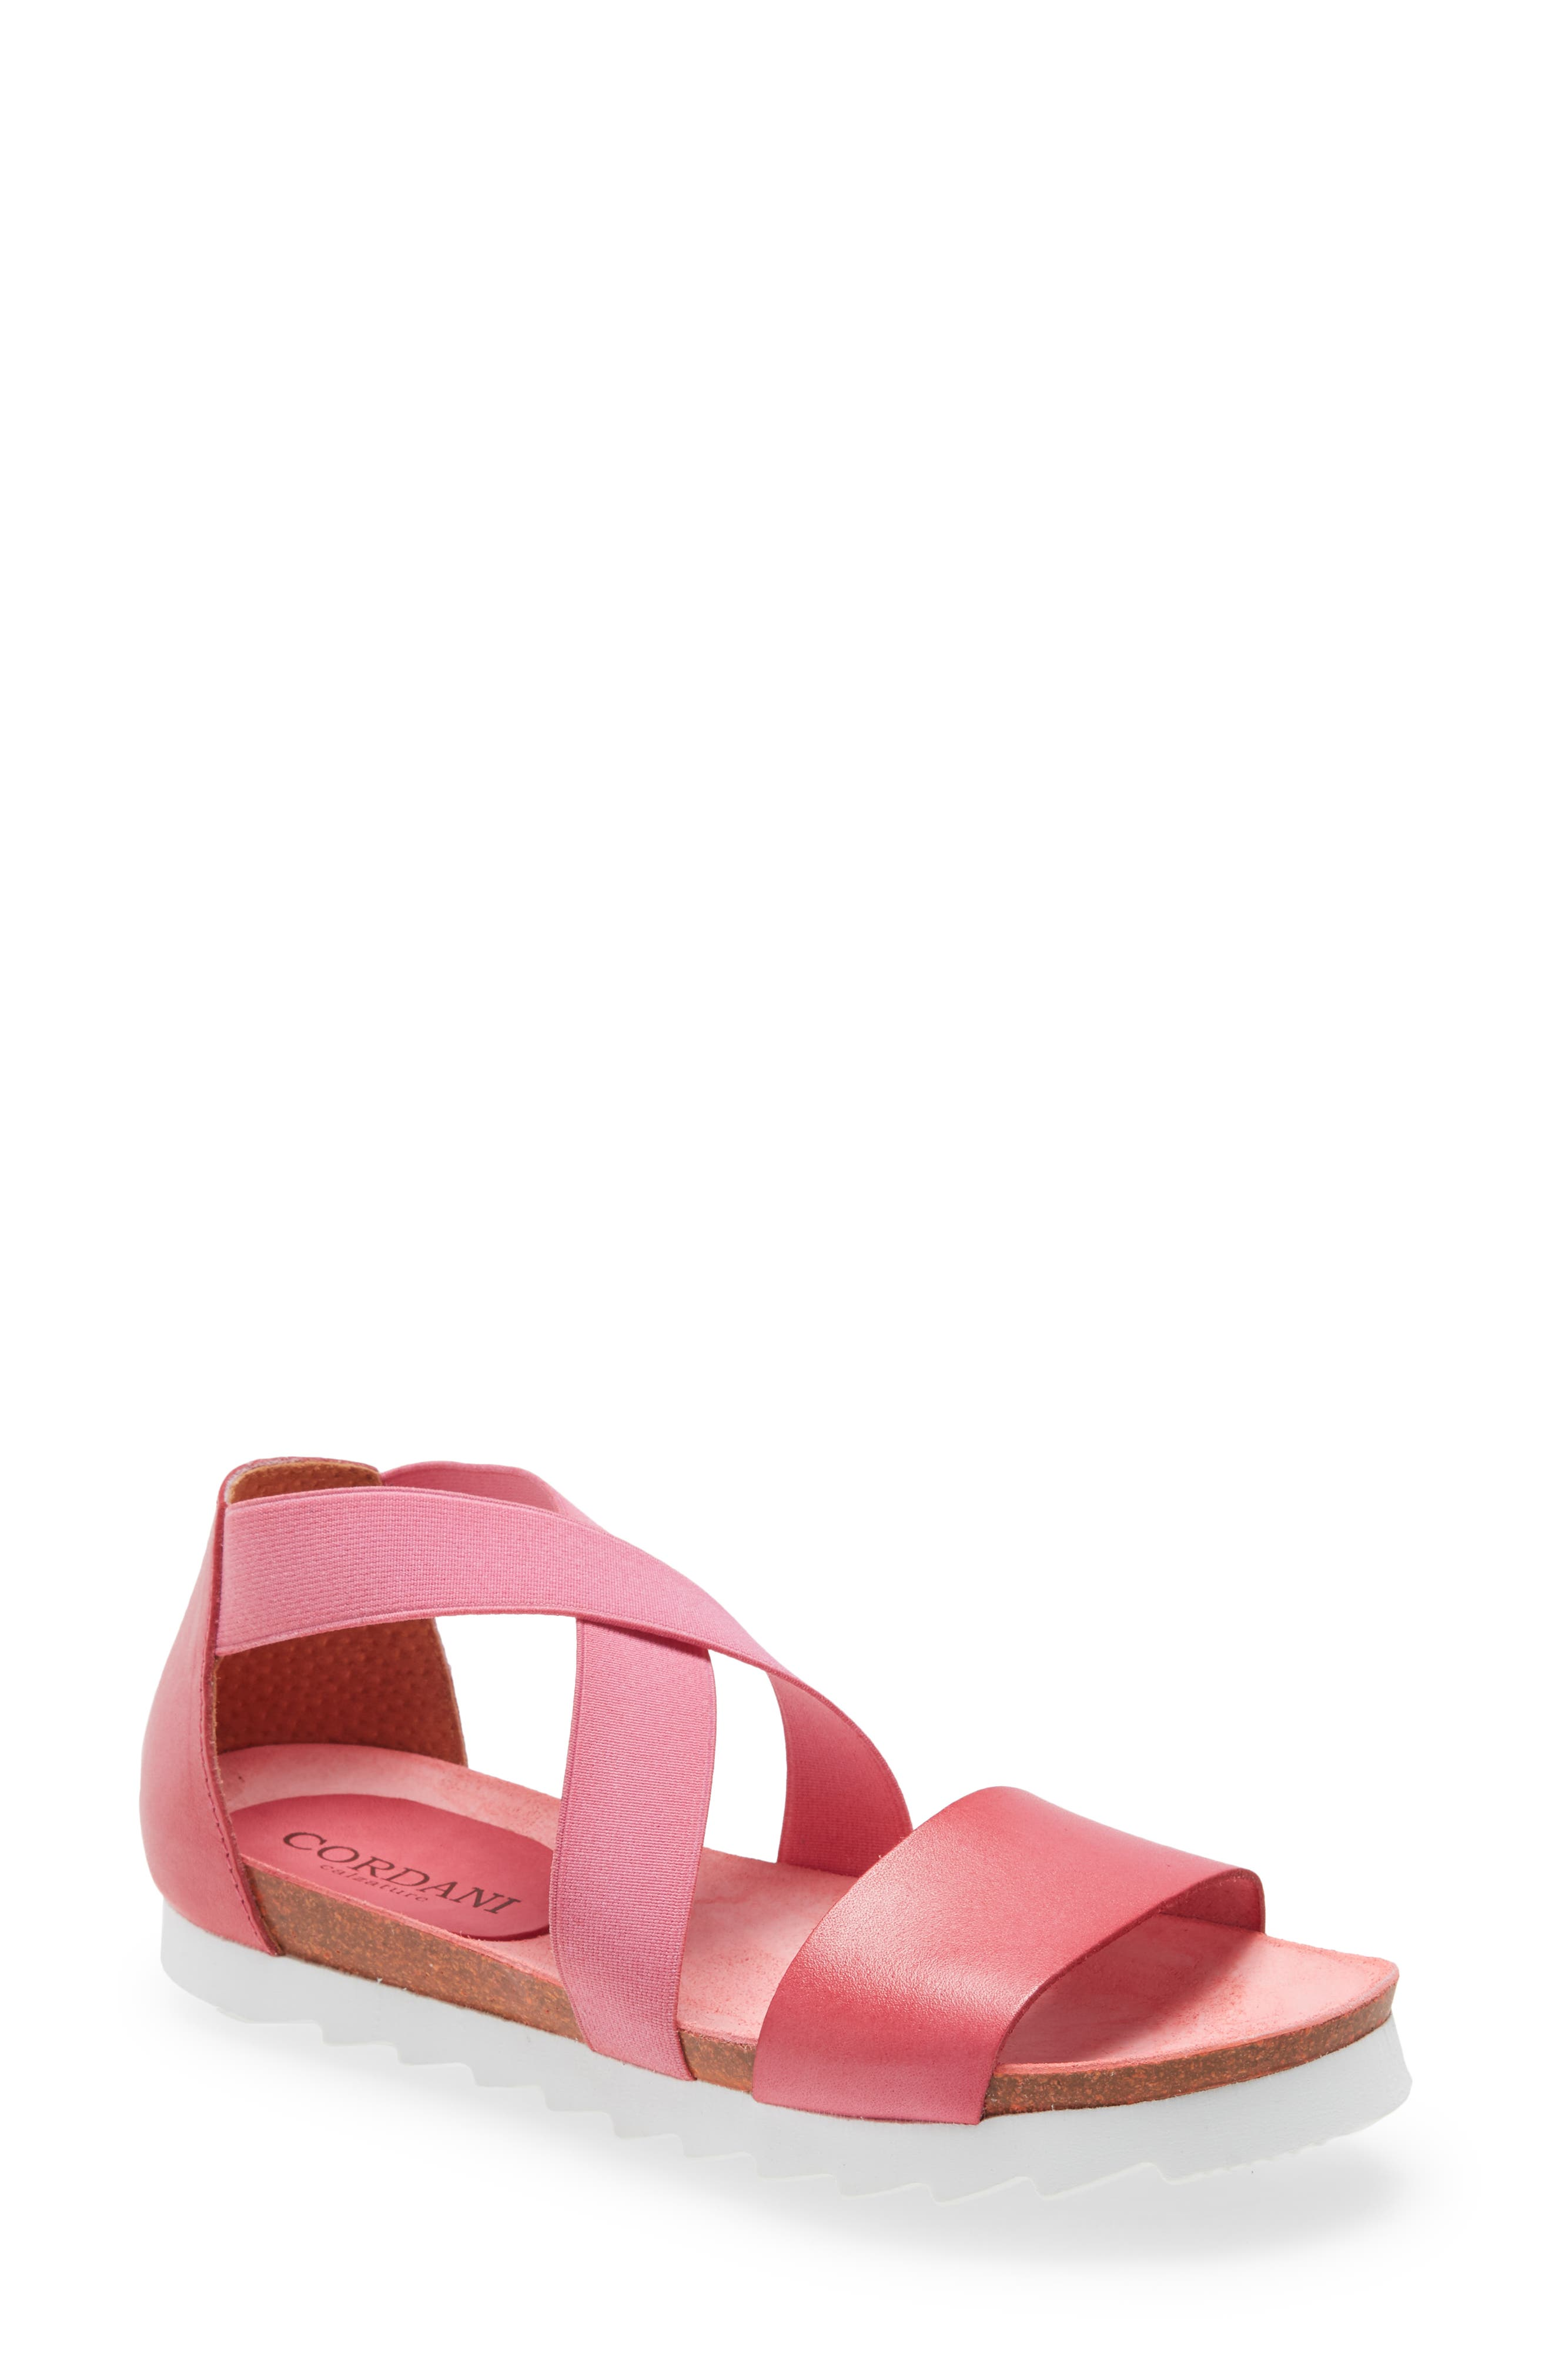 Sayger Strappy Sandal